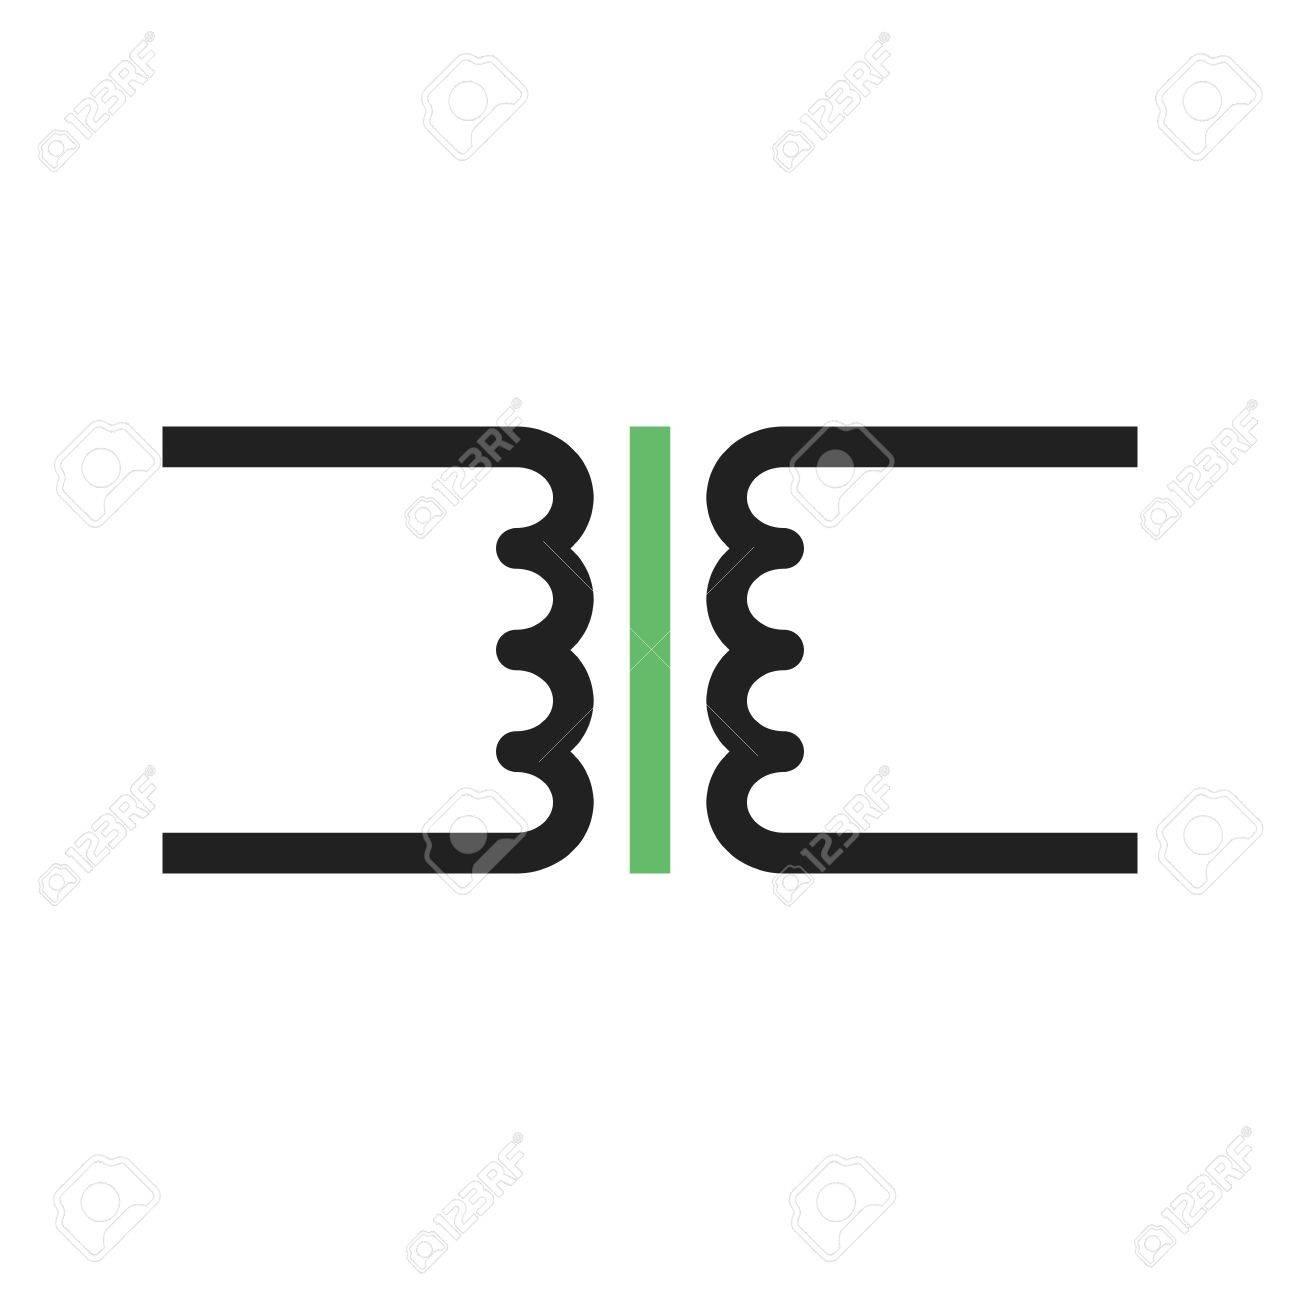 Nett Symbol Der Drossel Fotos - Schaltplan Serie Circuit Collection ...